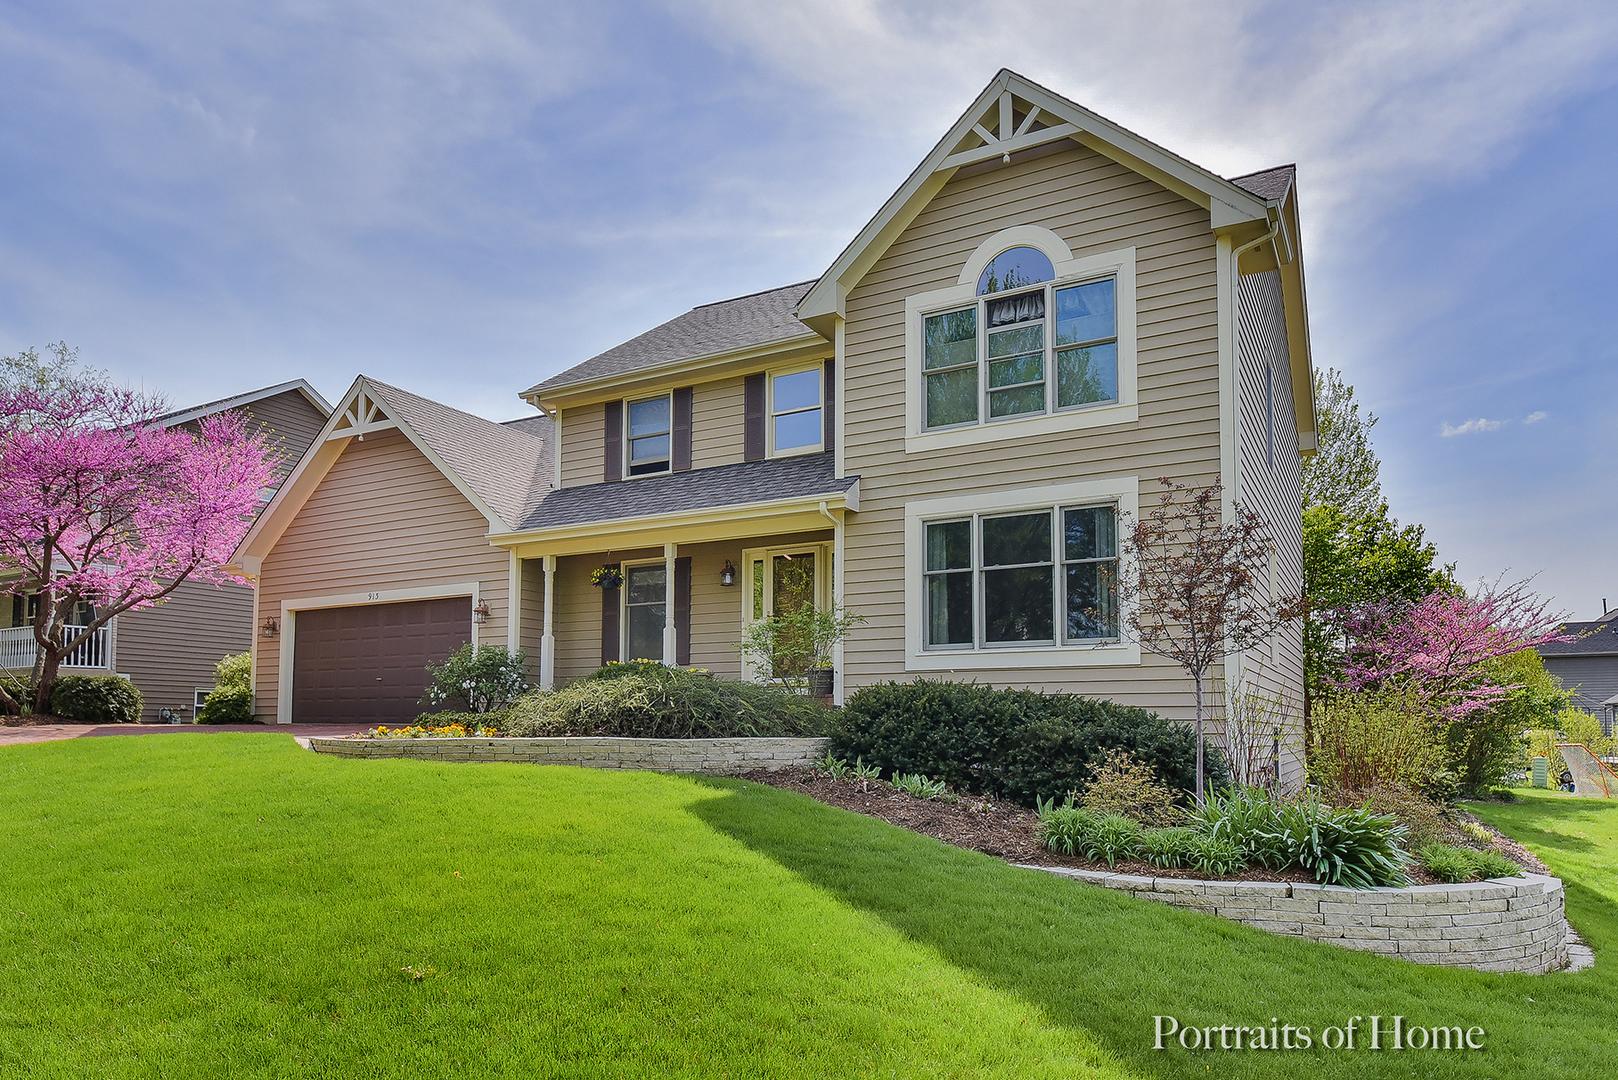 913 Jennifer Drive, Batavia in Kane County, IL 60510 Home for Sale